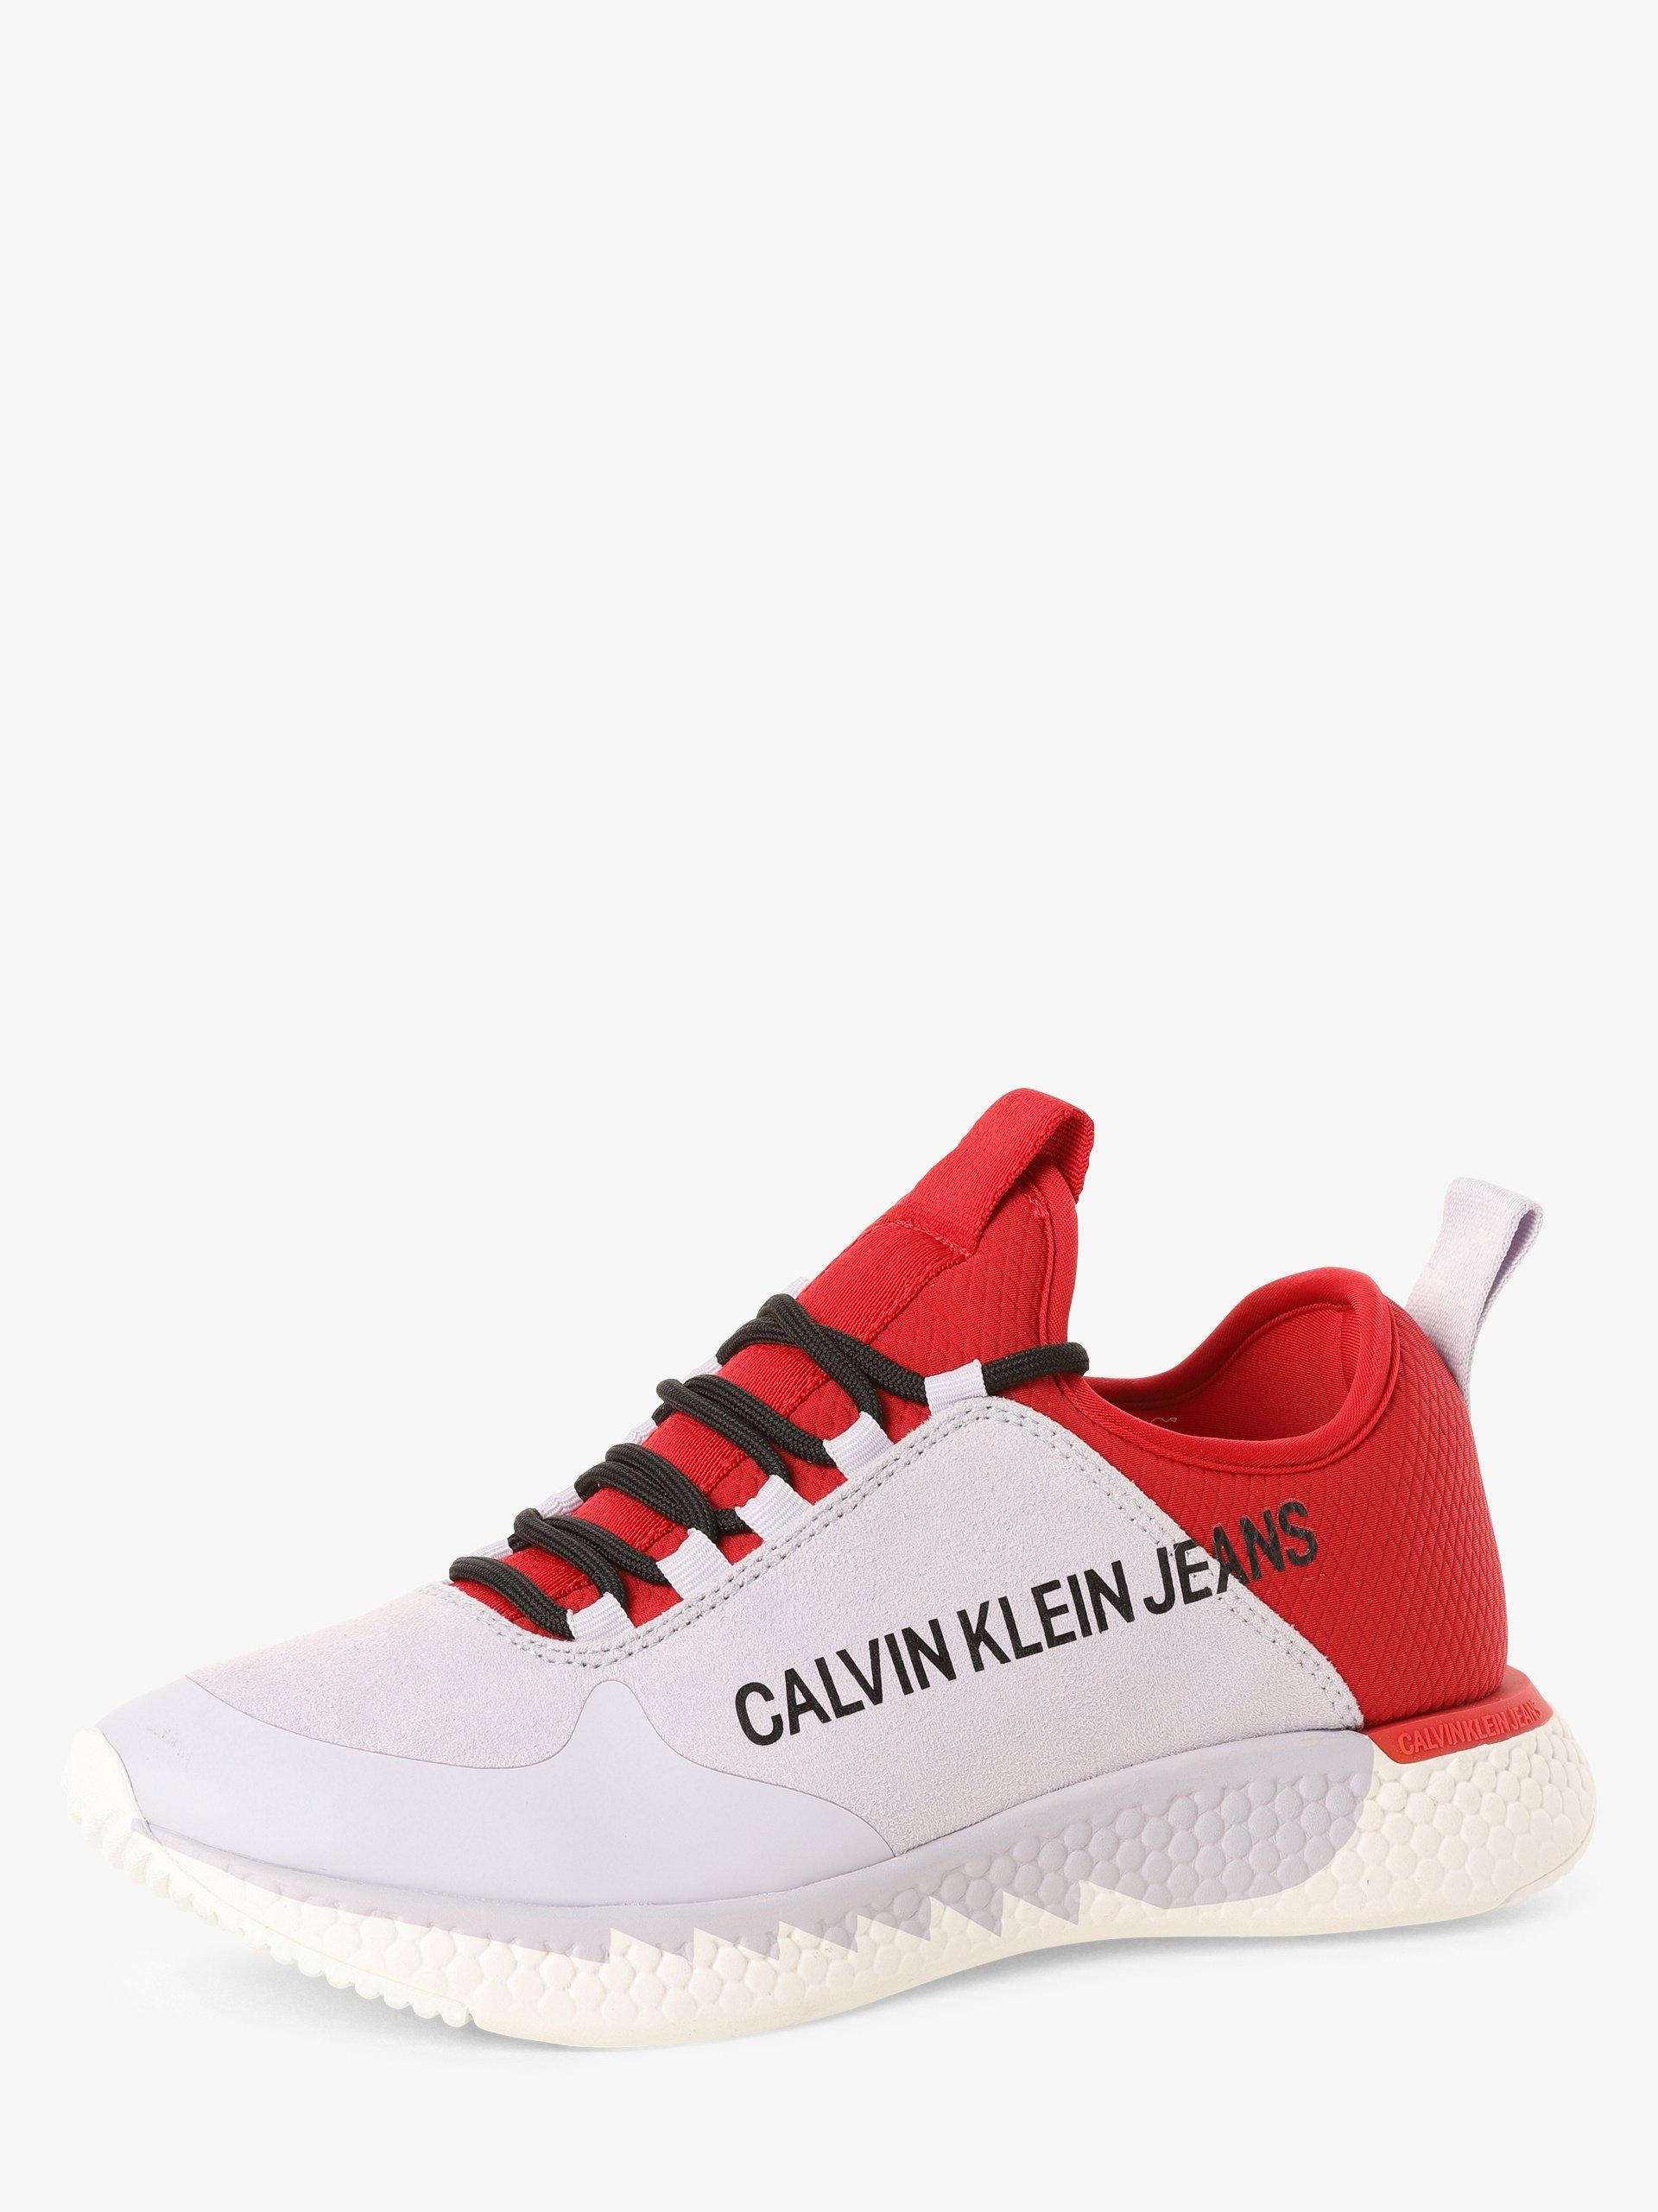 Calvin Klein Jeans Tenisówki damskie – Adamina